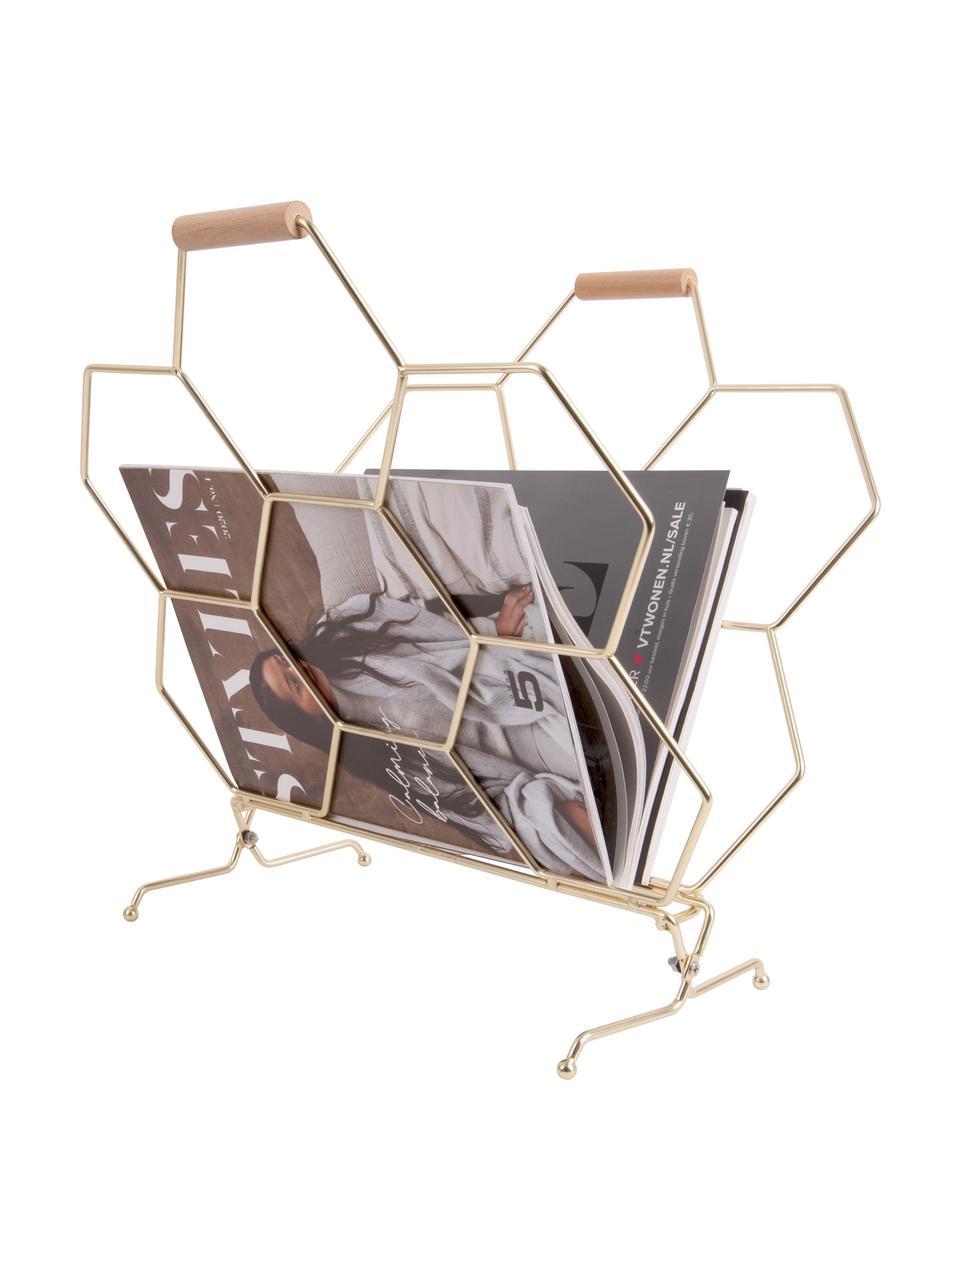 Zeitschriftenhalter Honeycomb, Griffe: Holz, Messingfarben, Holz, 40 x 45 cm